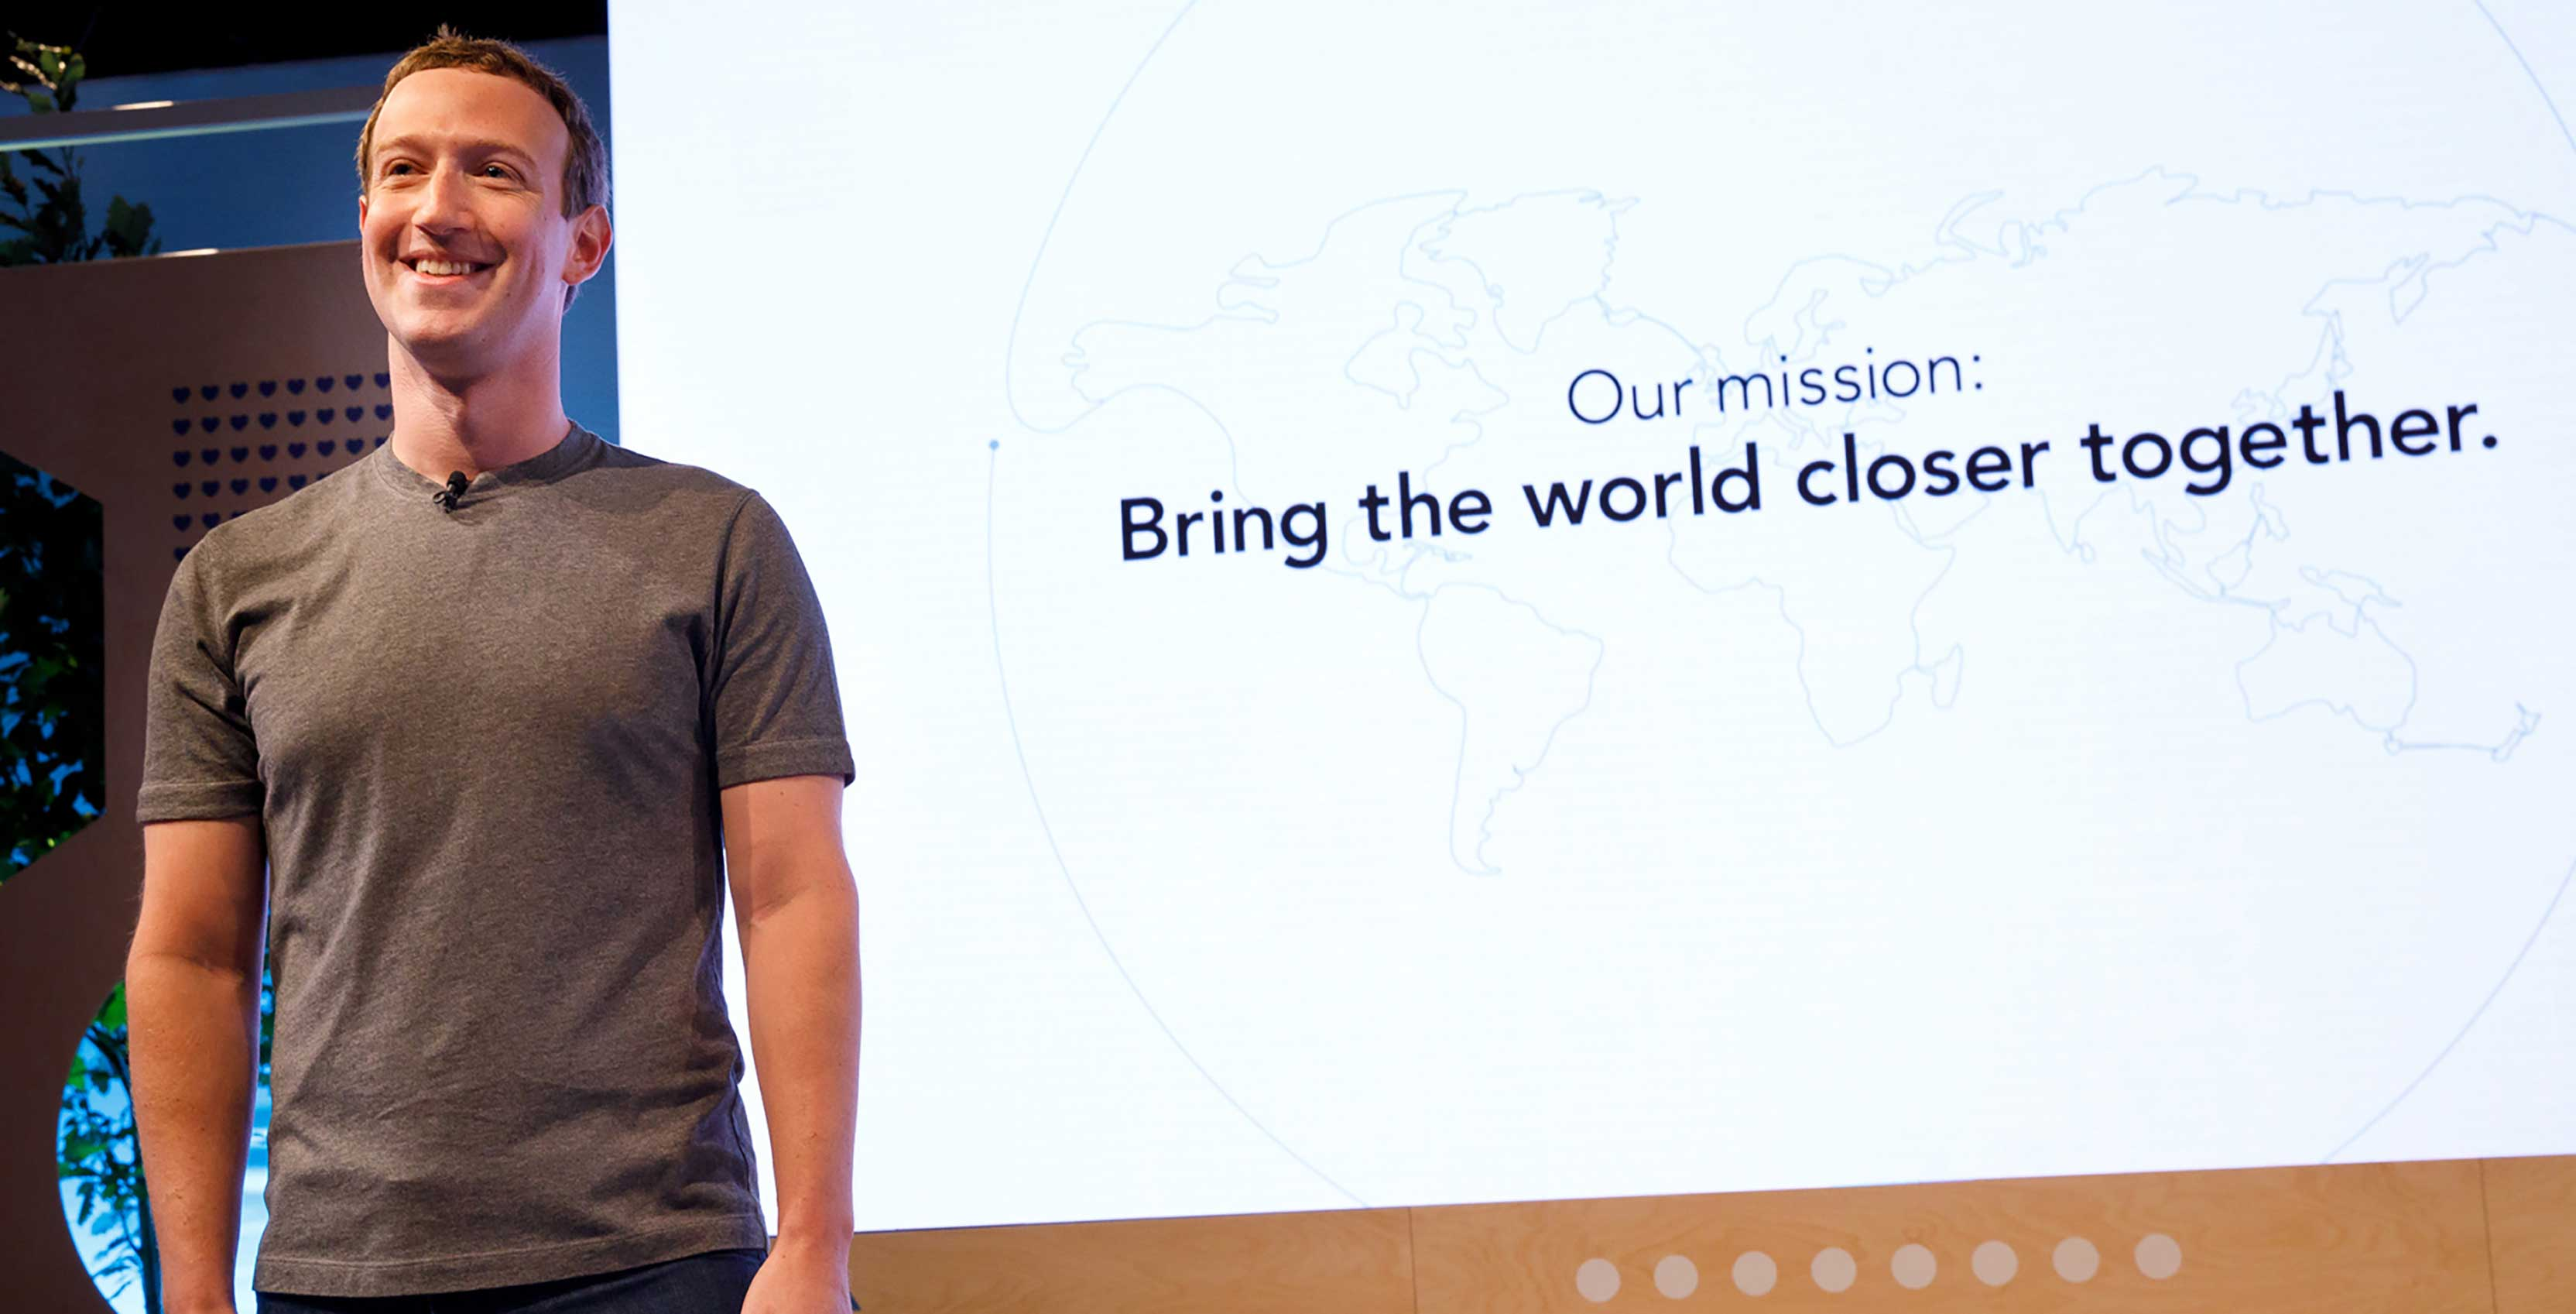 Mark Zuckerberg Facebook mission